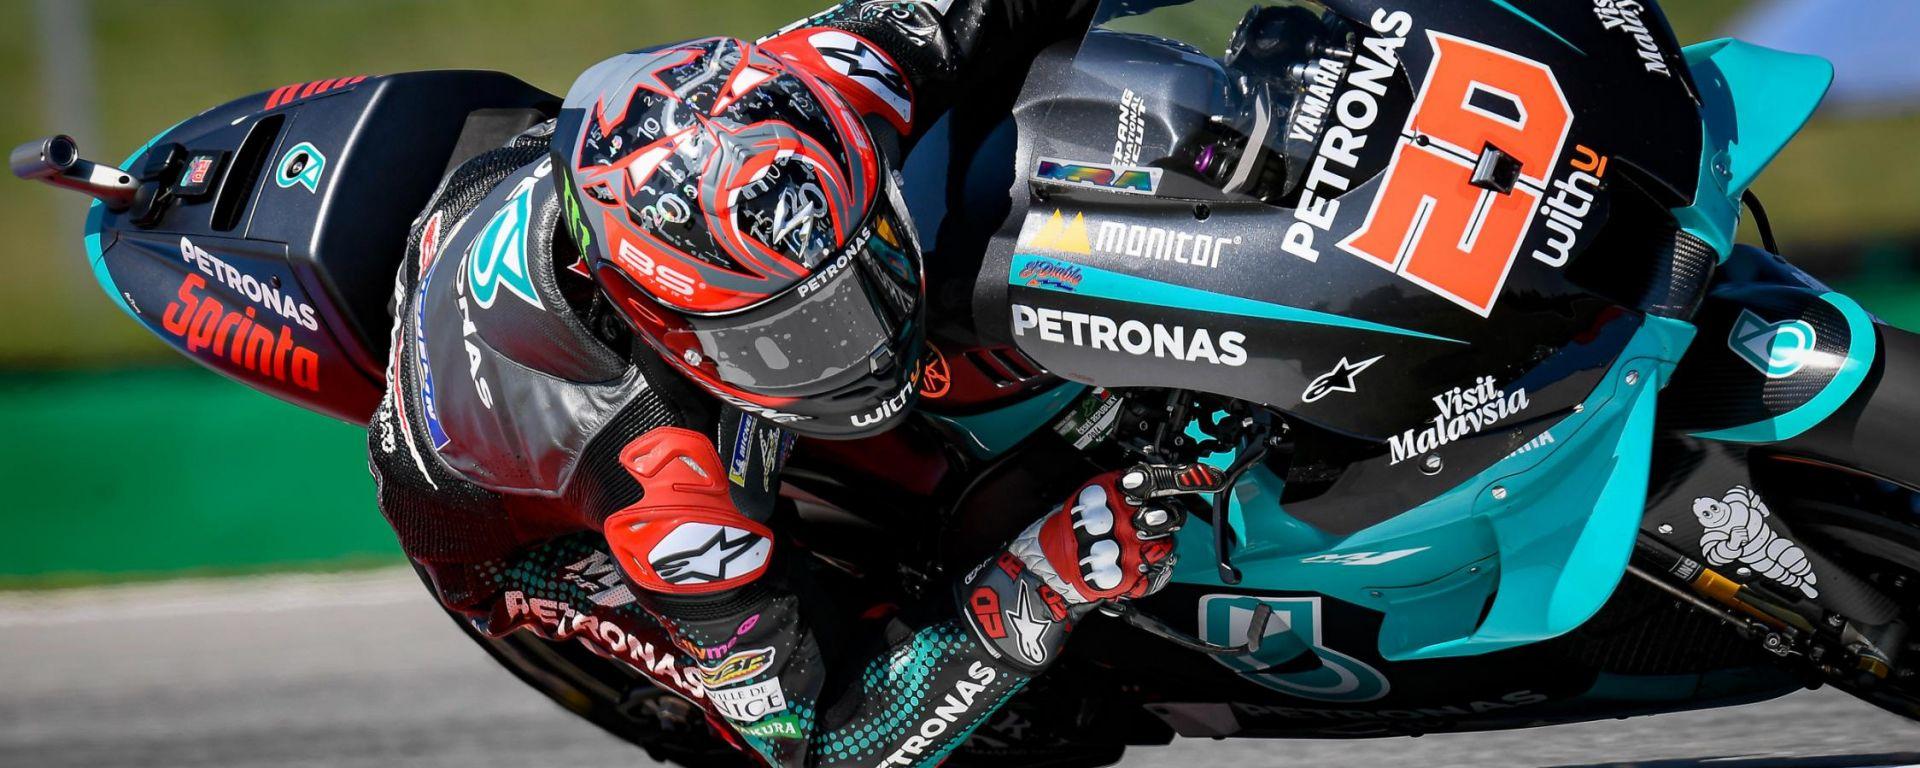 MotoGP Rep Ceca 2020, Brno: Fabio Quartararo (Yamaha)